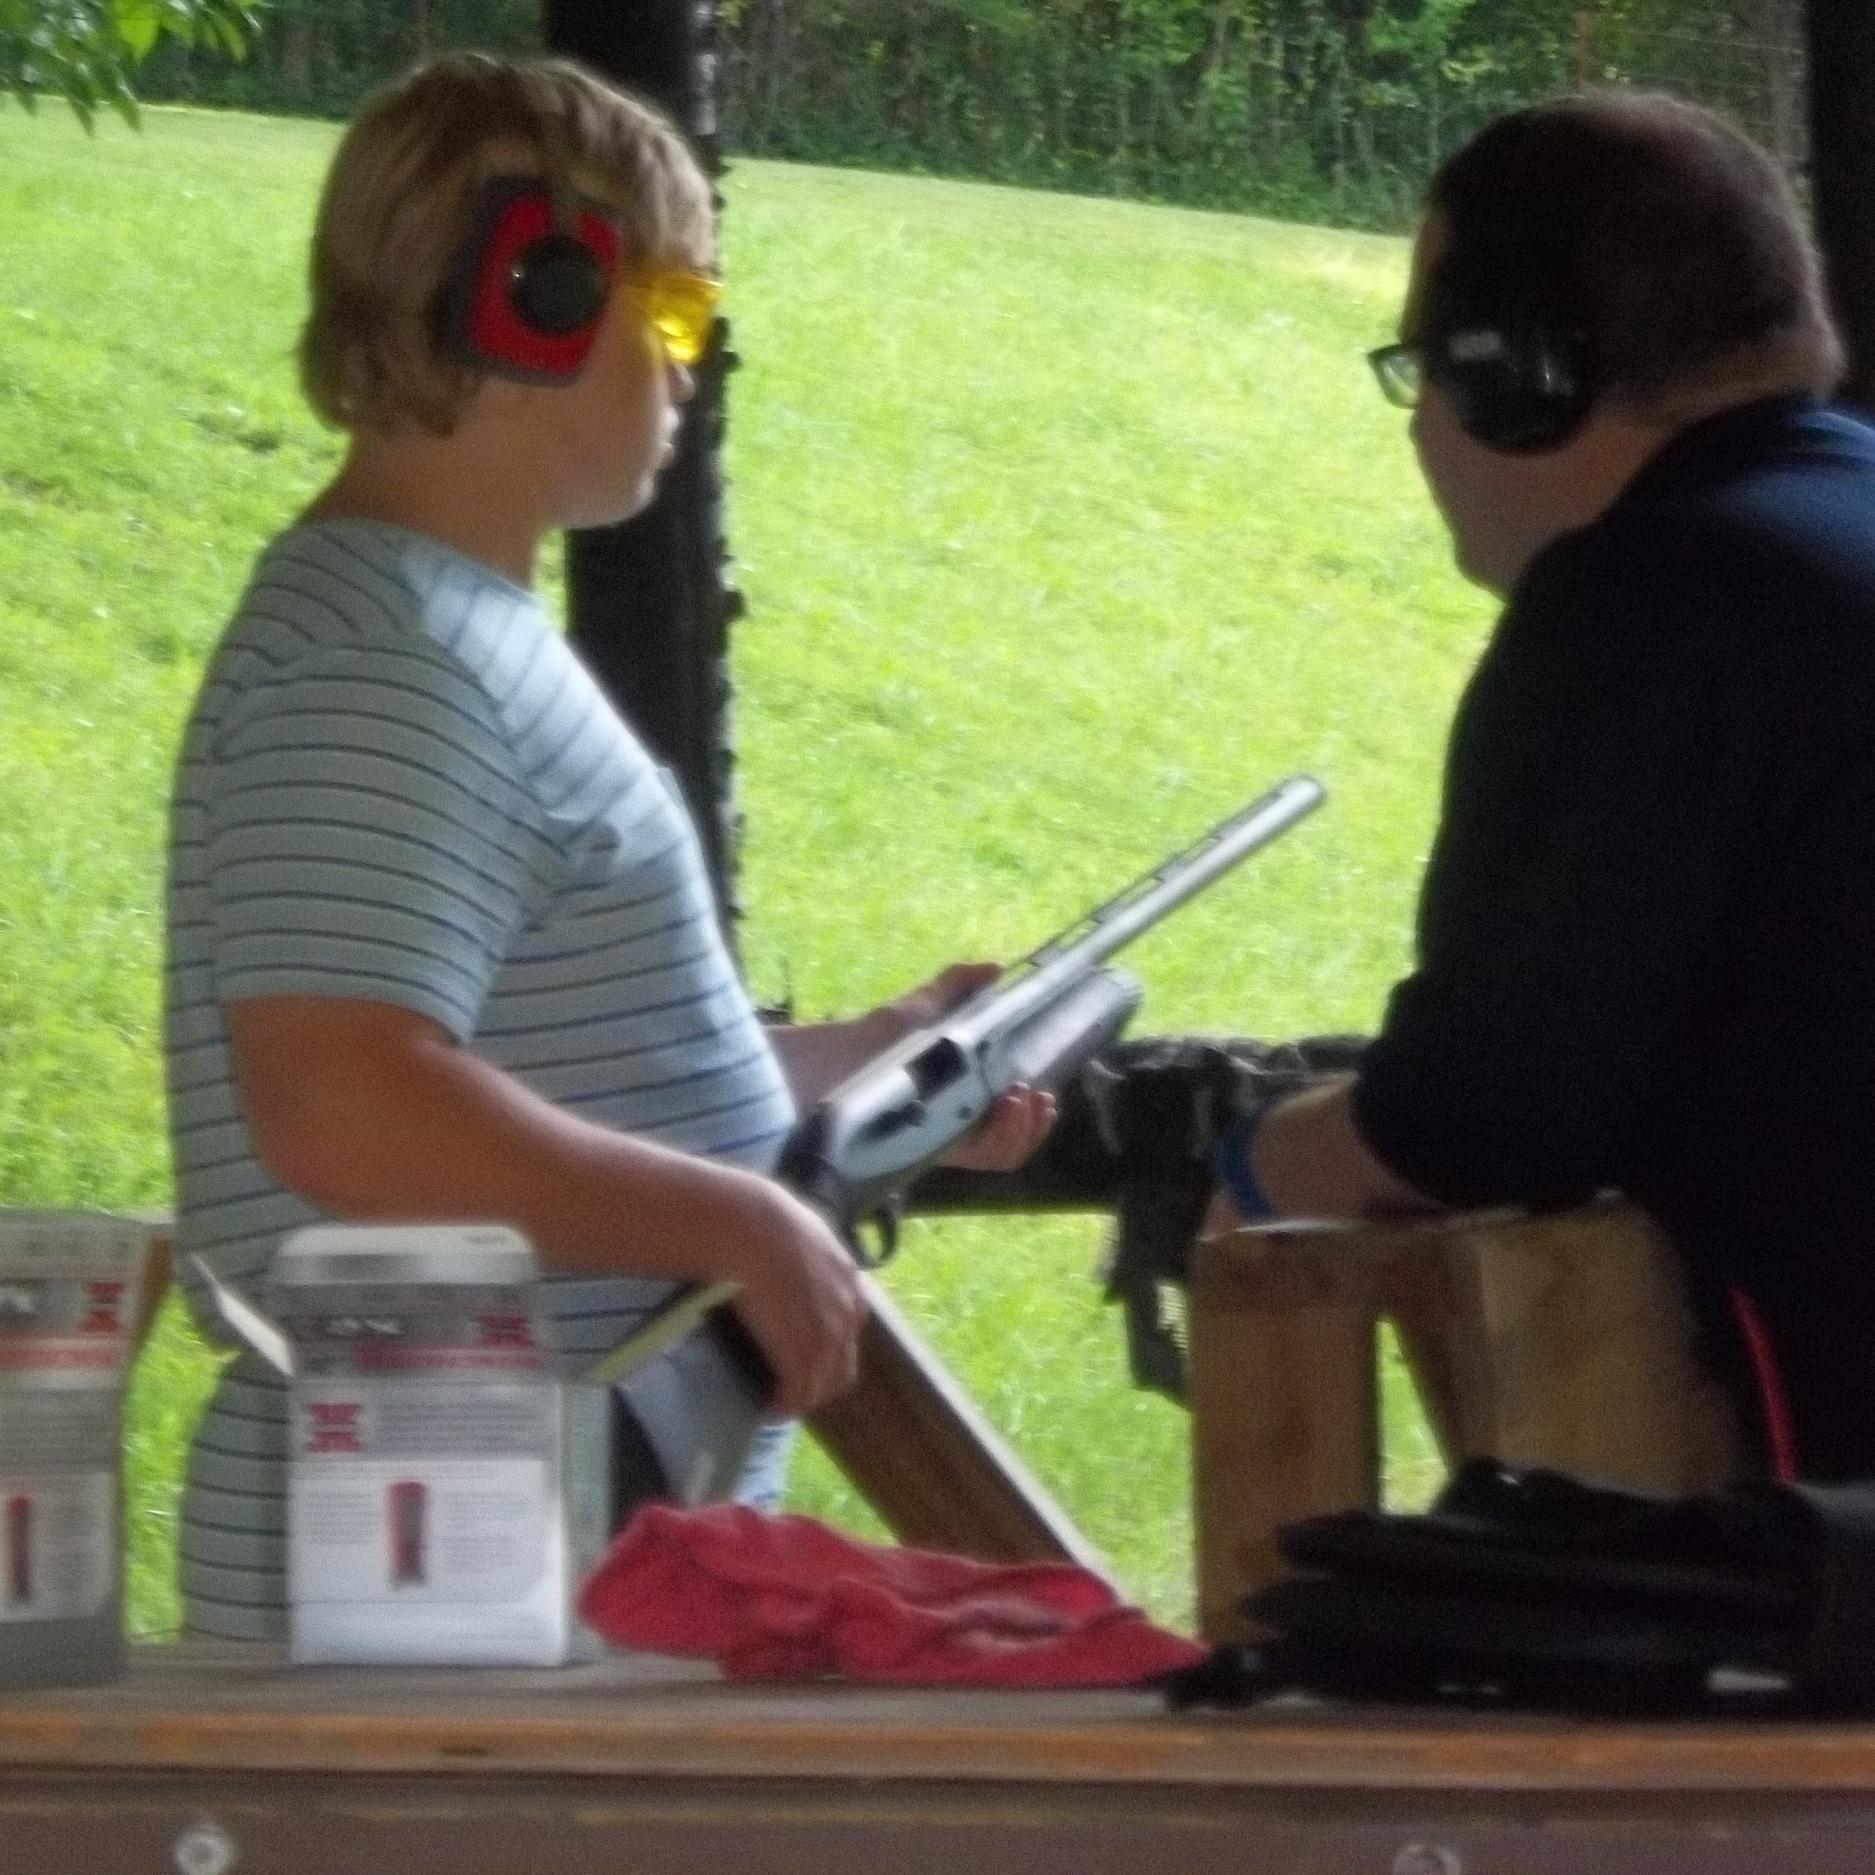 Shotgun, Rifle, and Archery